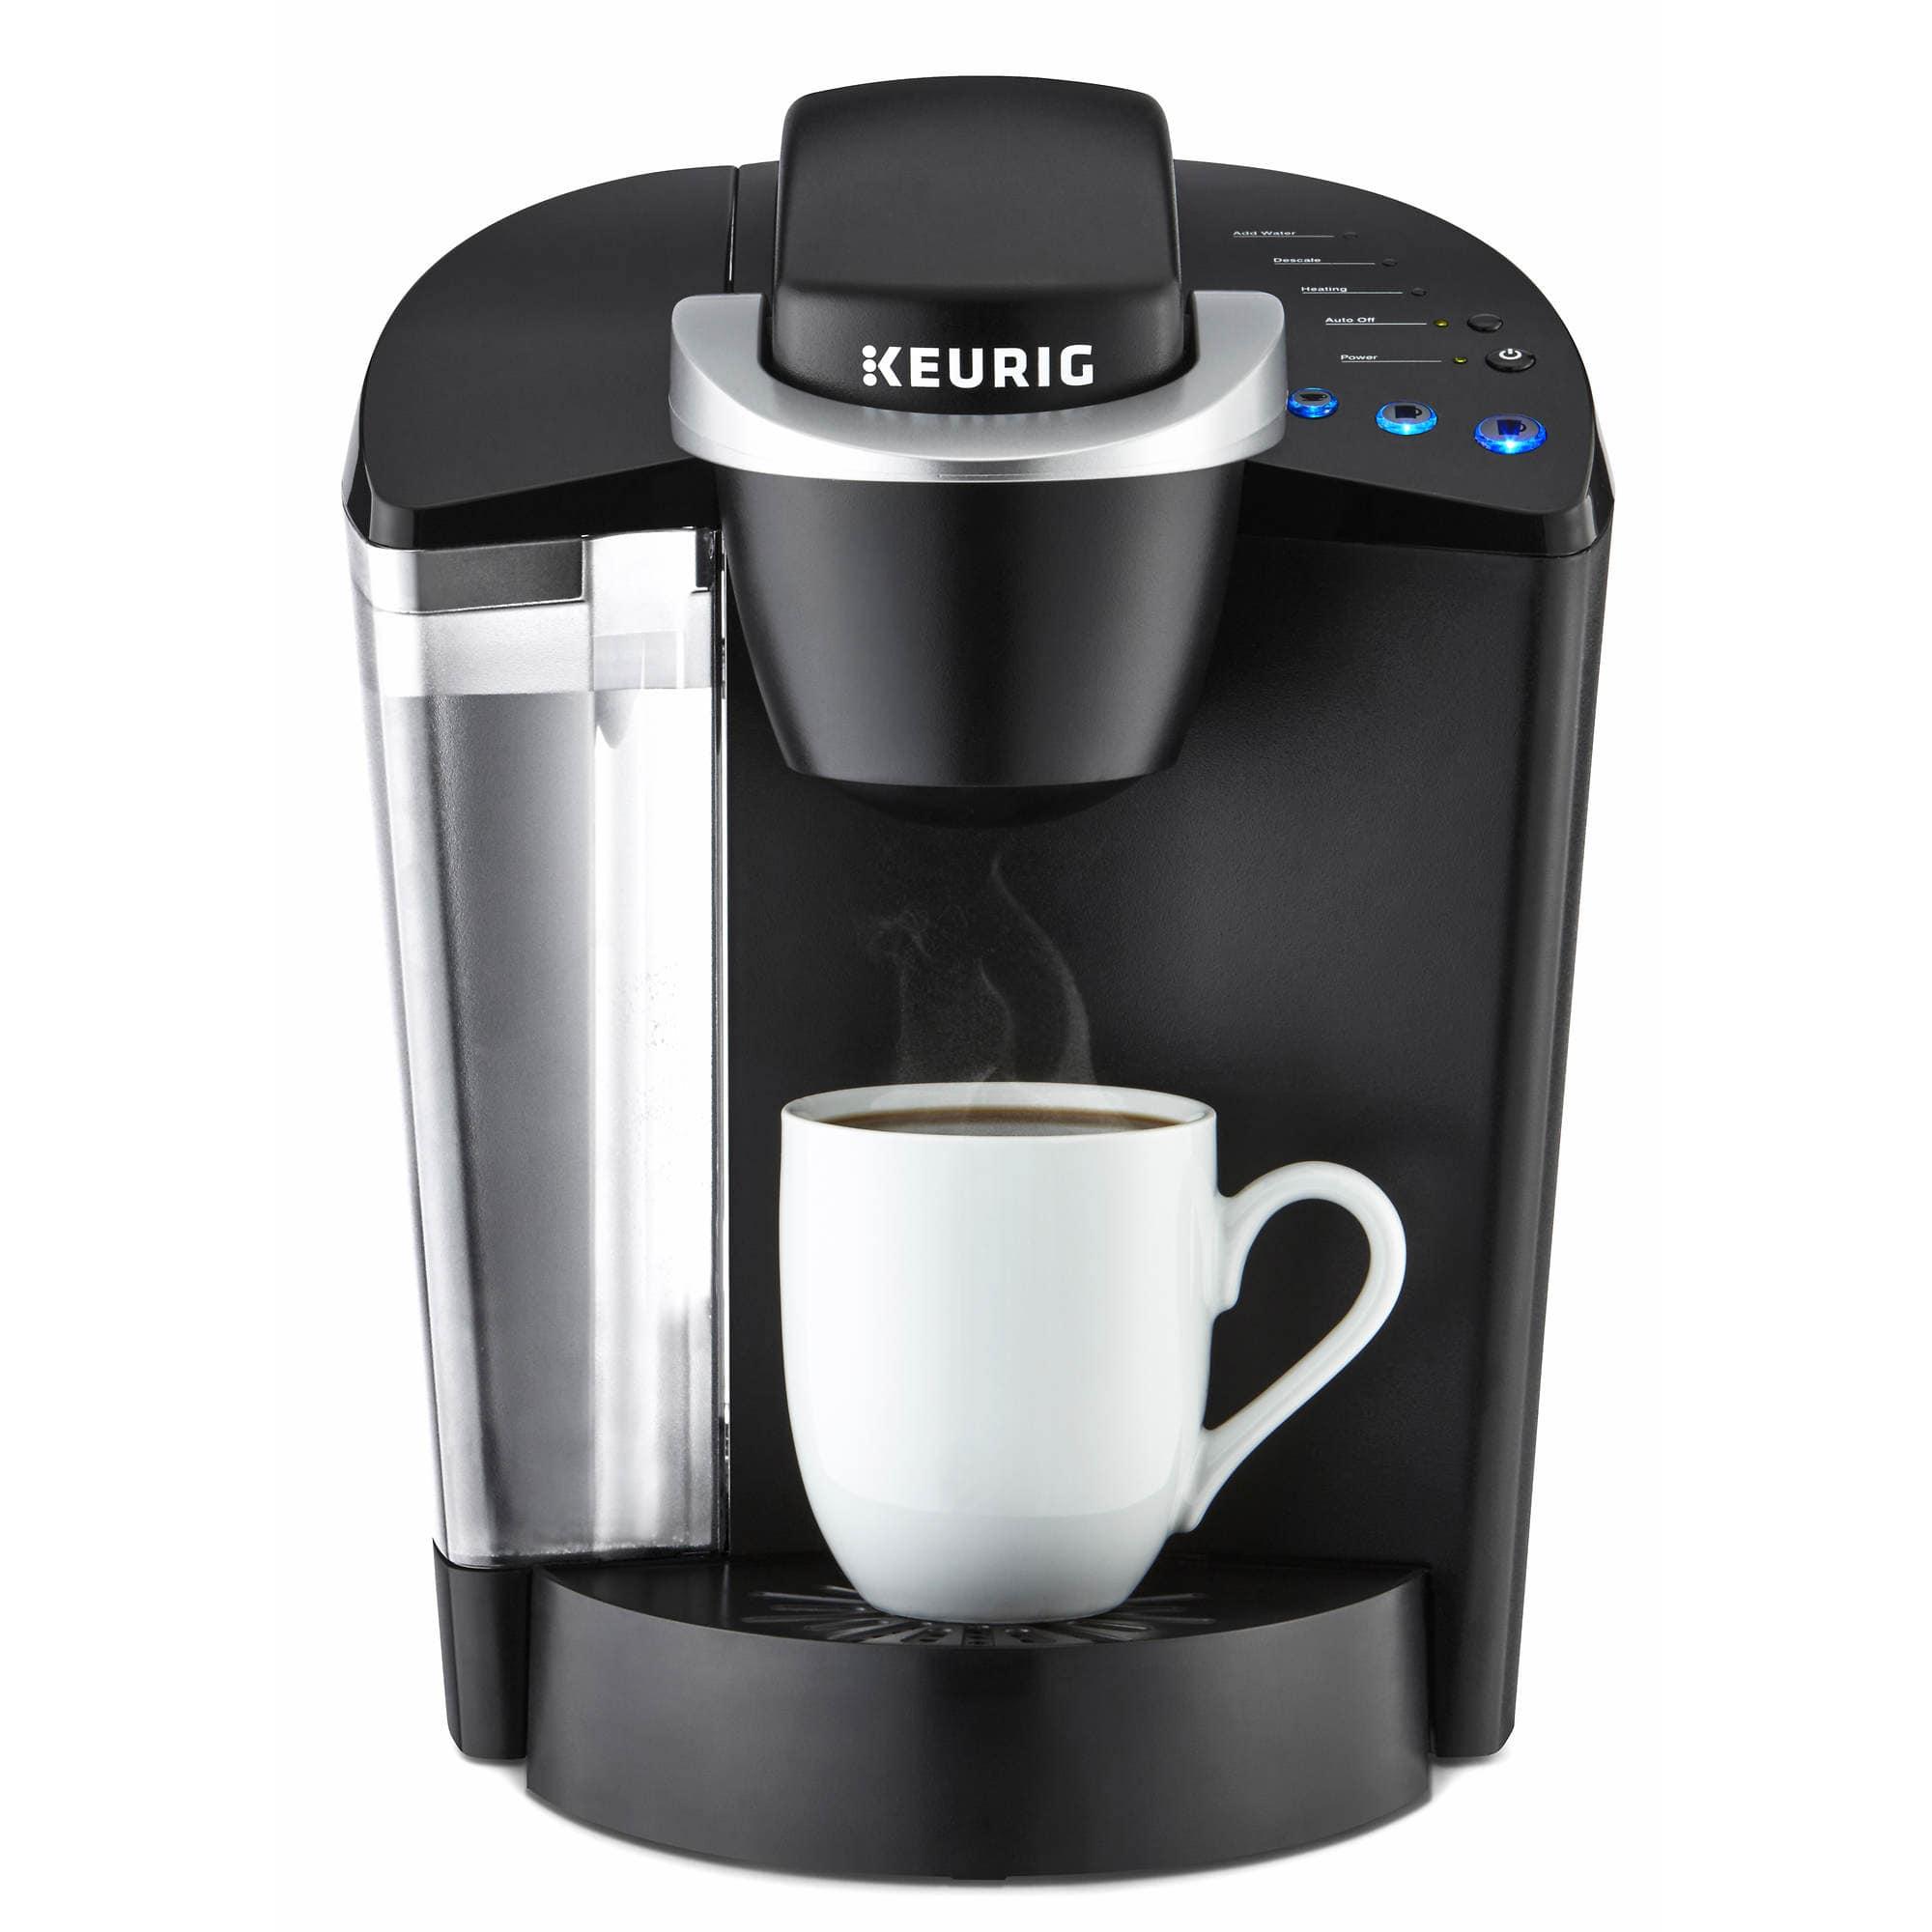 Keurig K-Classic K50 Single Serve Coffee Maker @$49.98